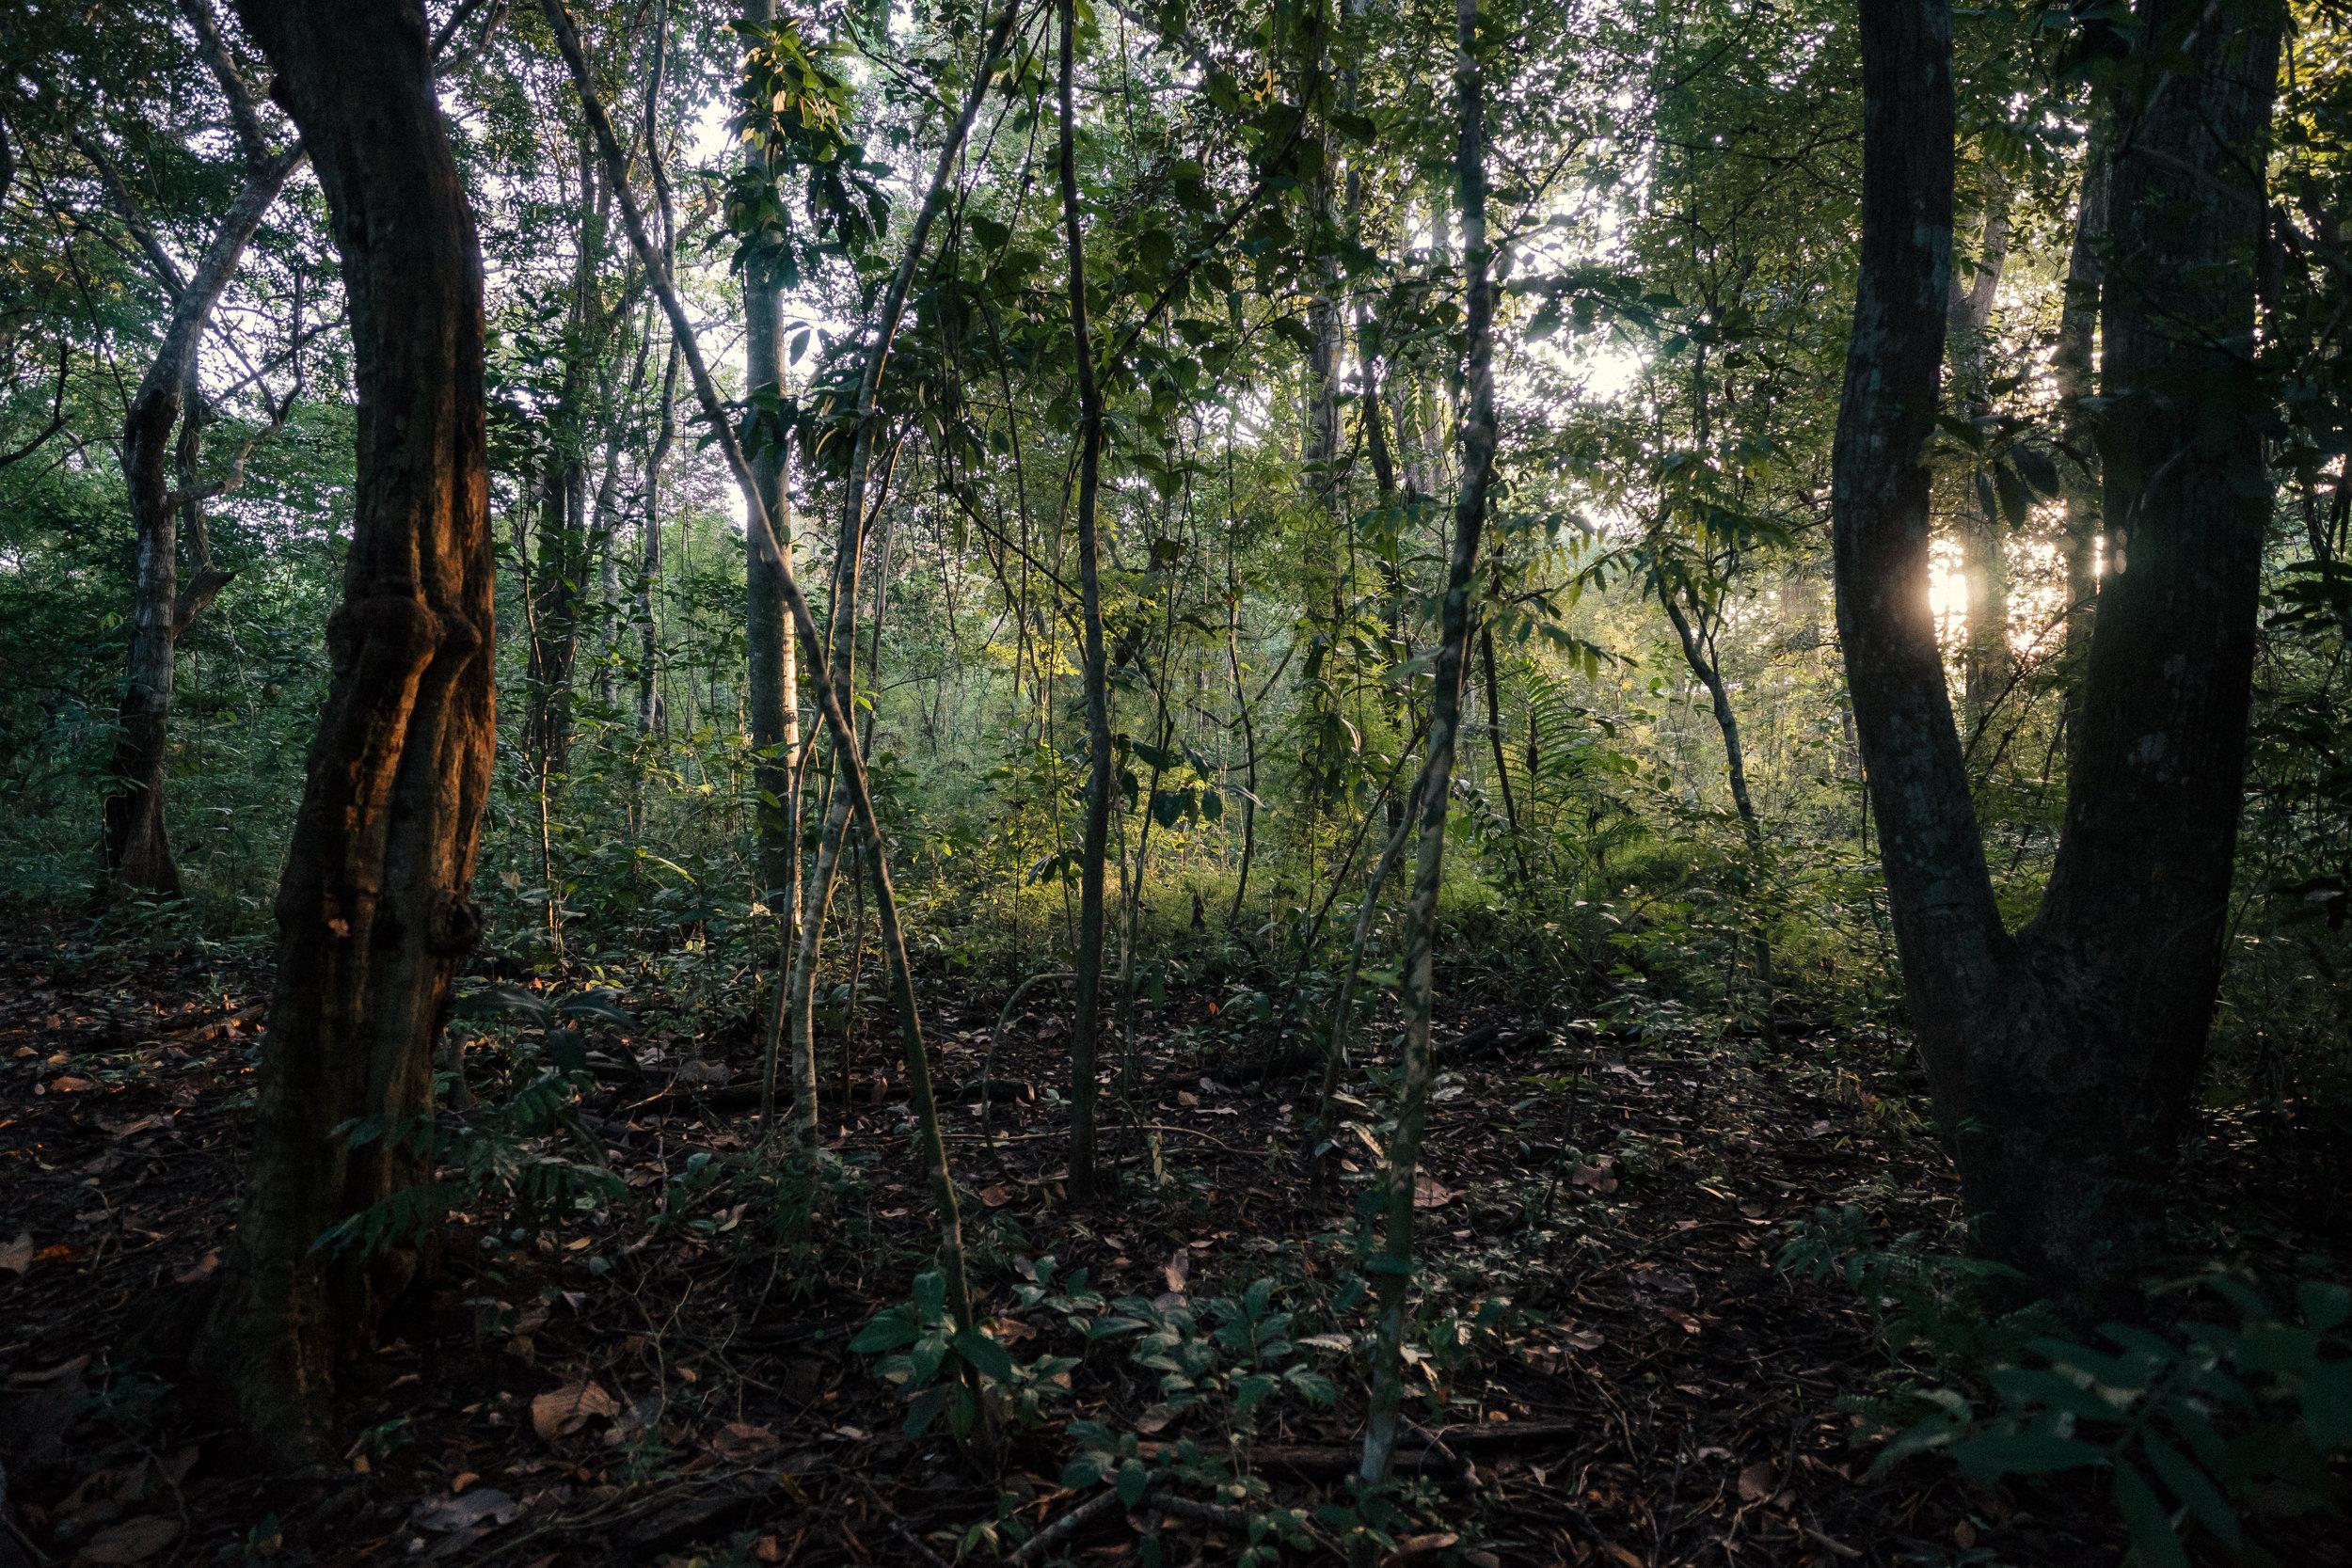 Dry tropical forest habitat